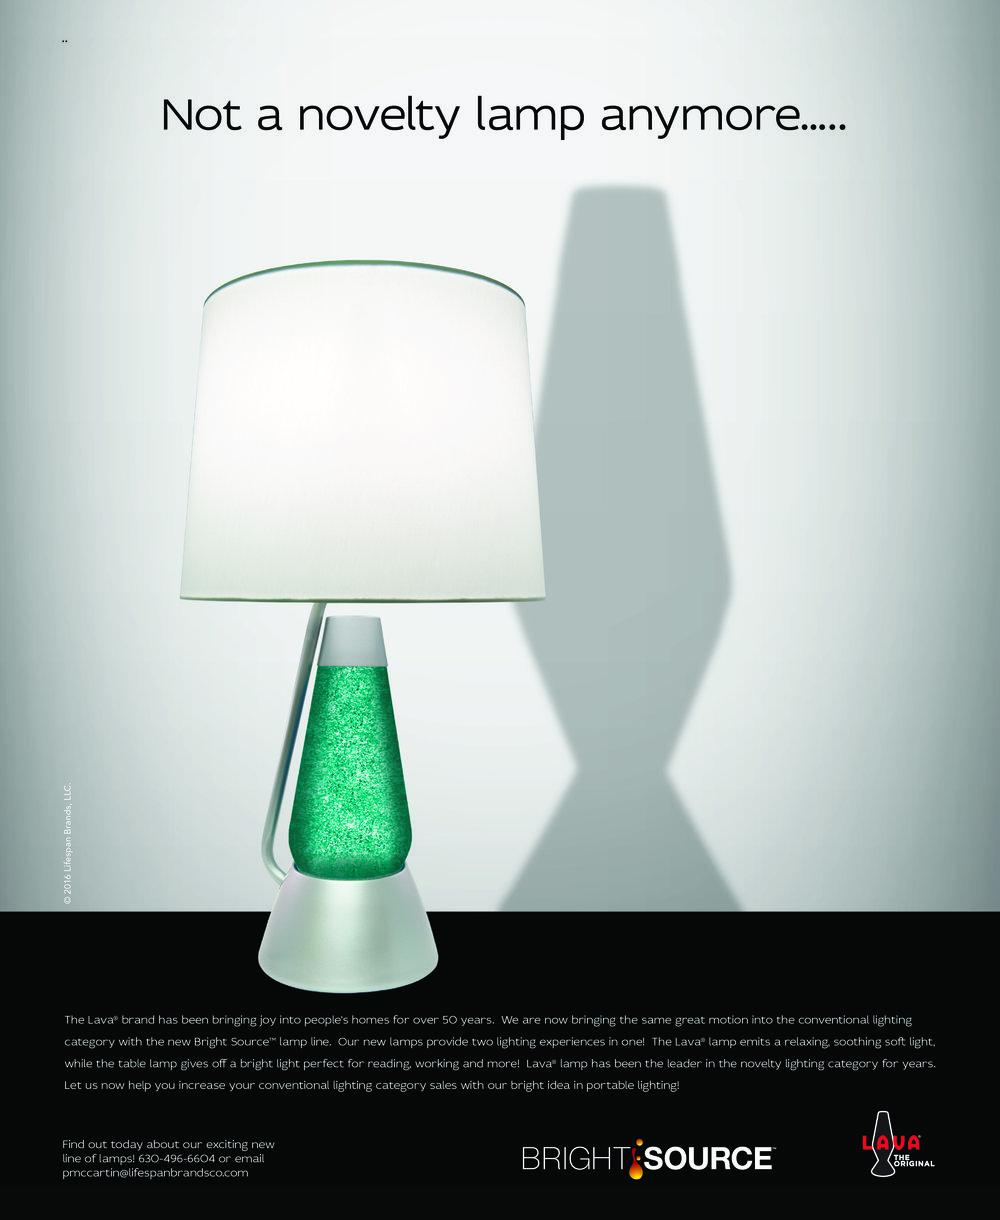 HomeWorldBusiness_BRIGHT SOURCE_NEW IDEA-04.jpg